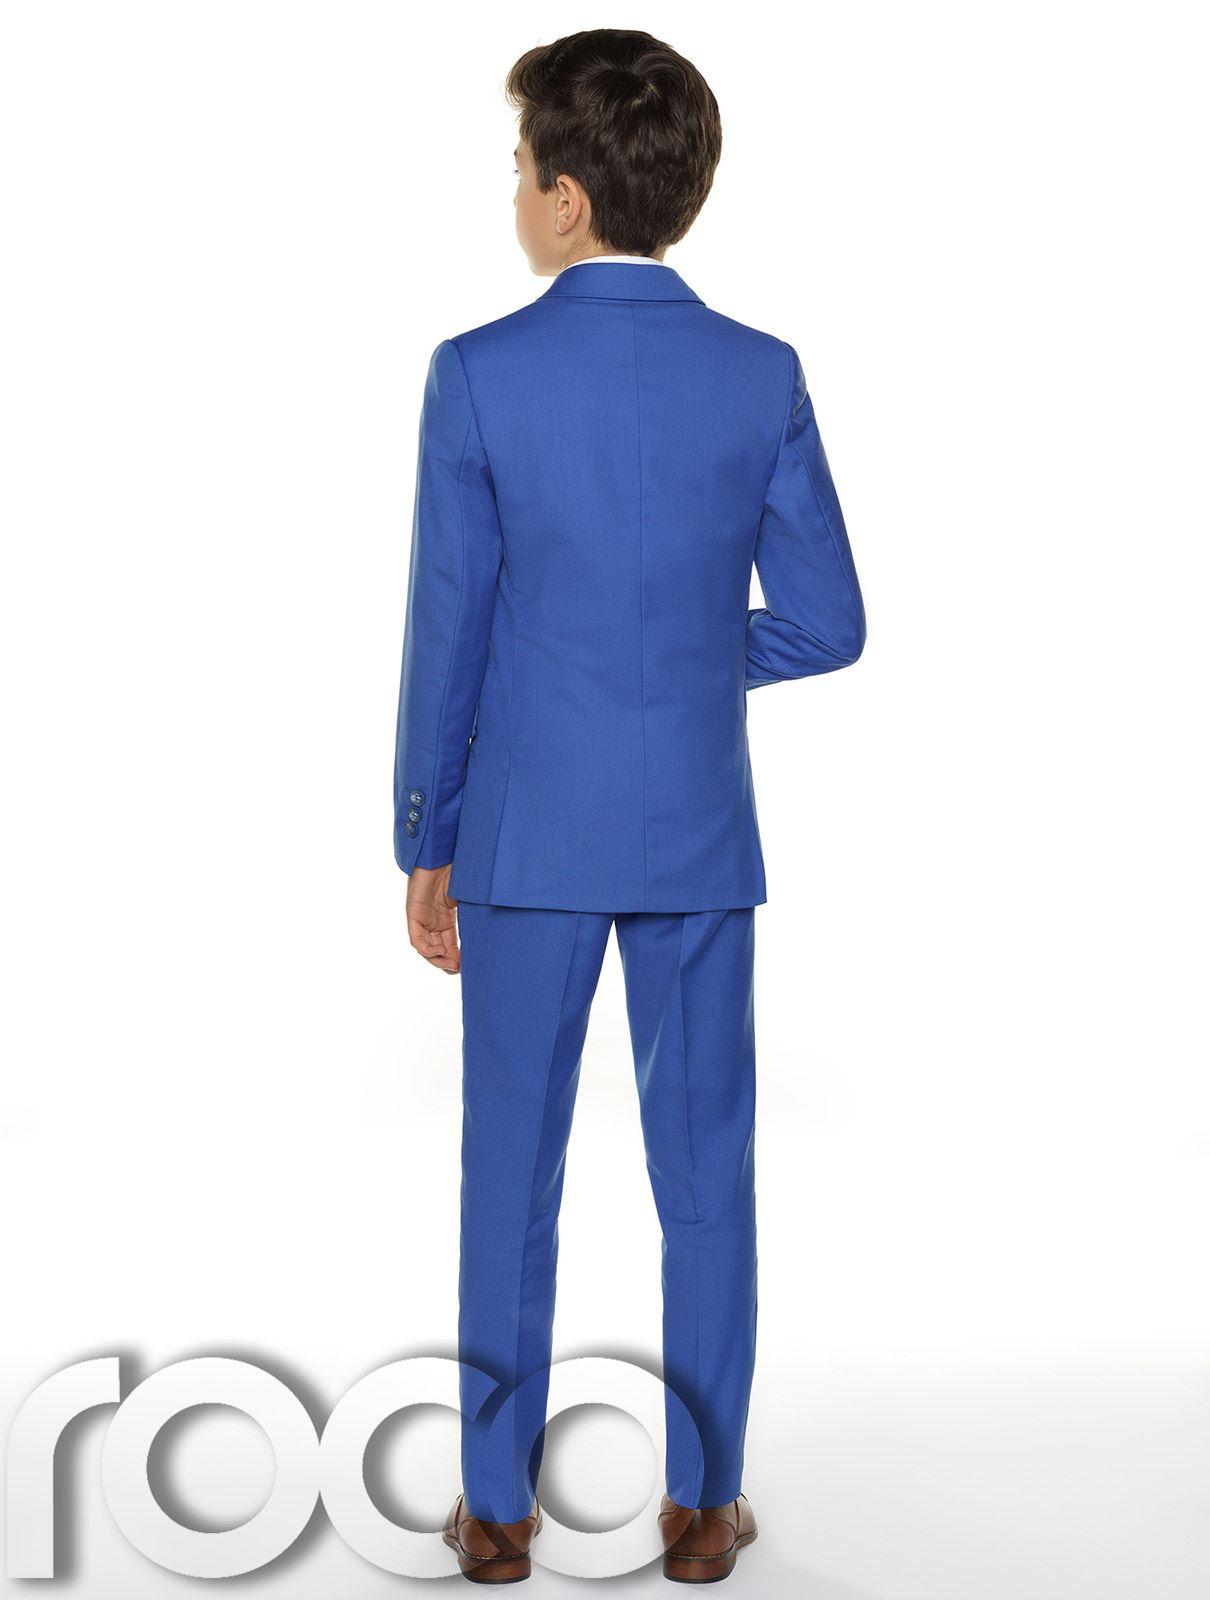 Garcons-Costume-Bleu-Communion-Costume-Bleu-Communion-Costume miniature 8